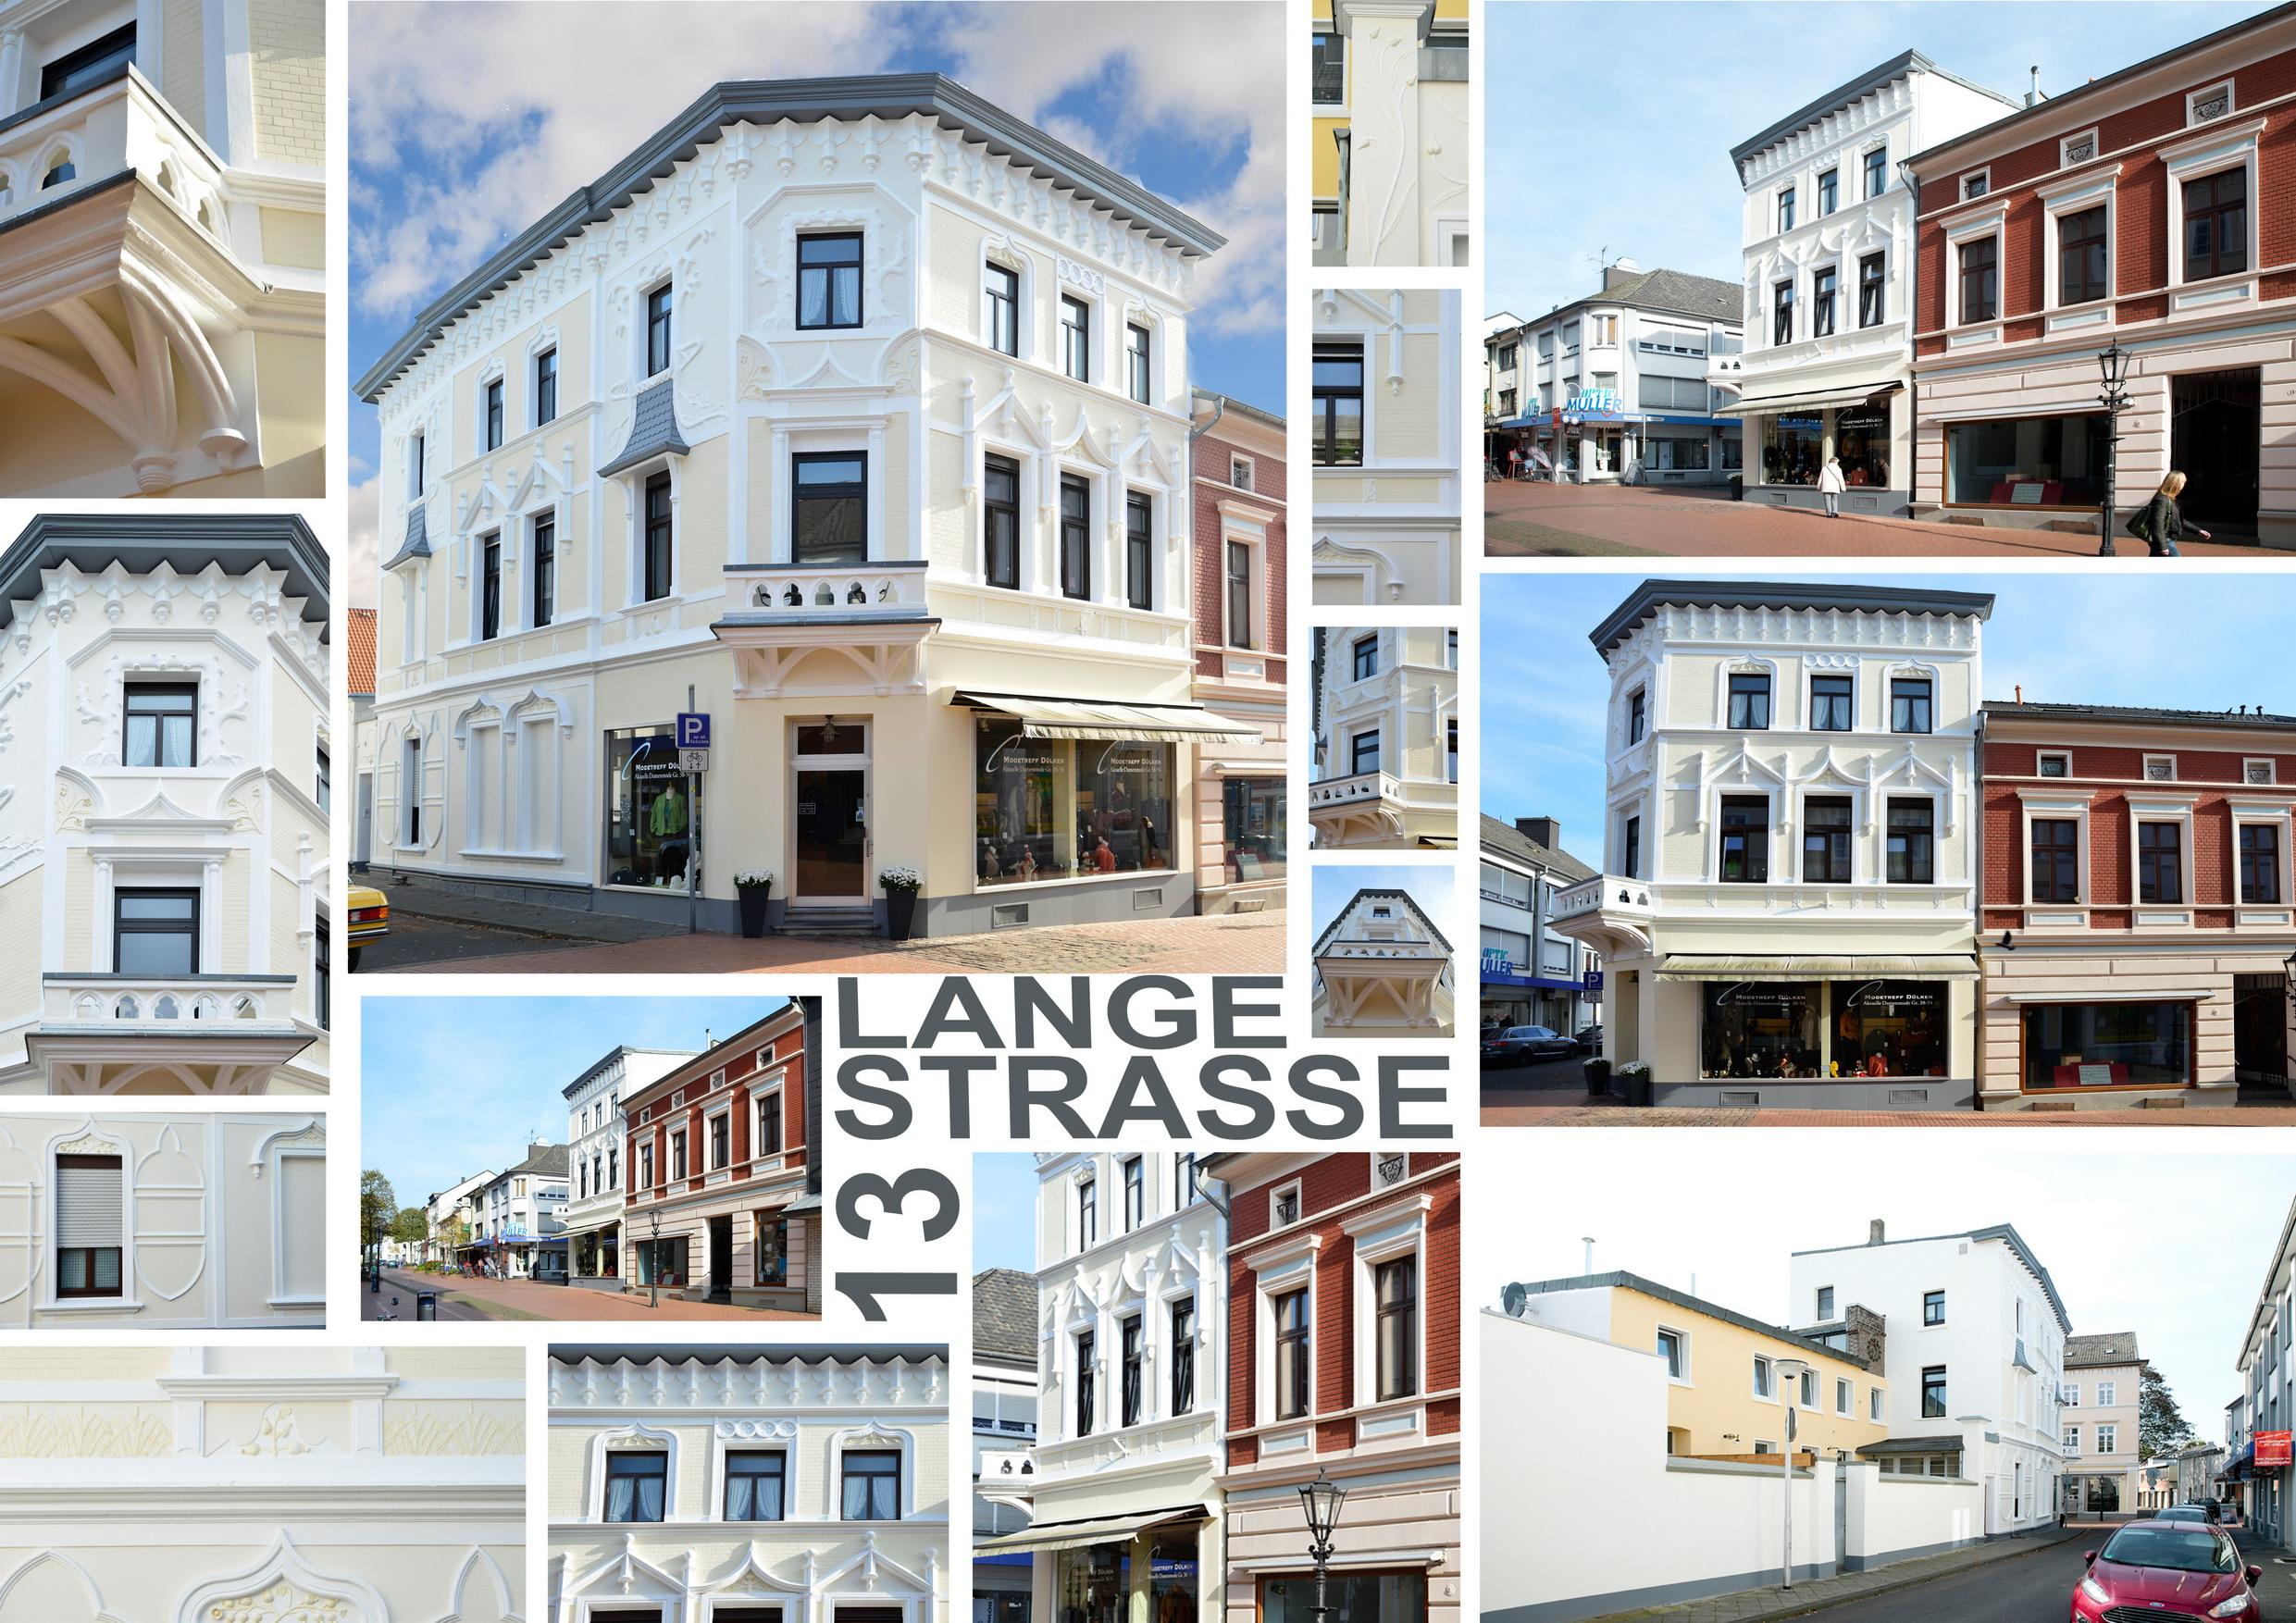 Langestrasse-13